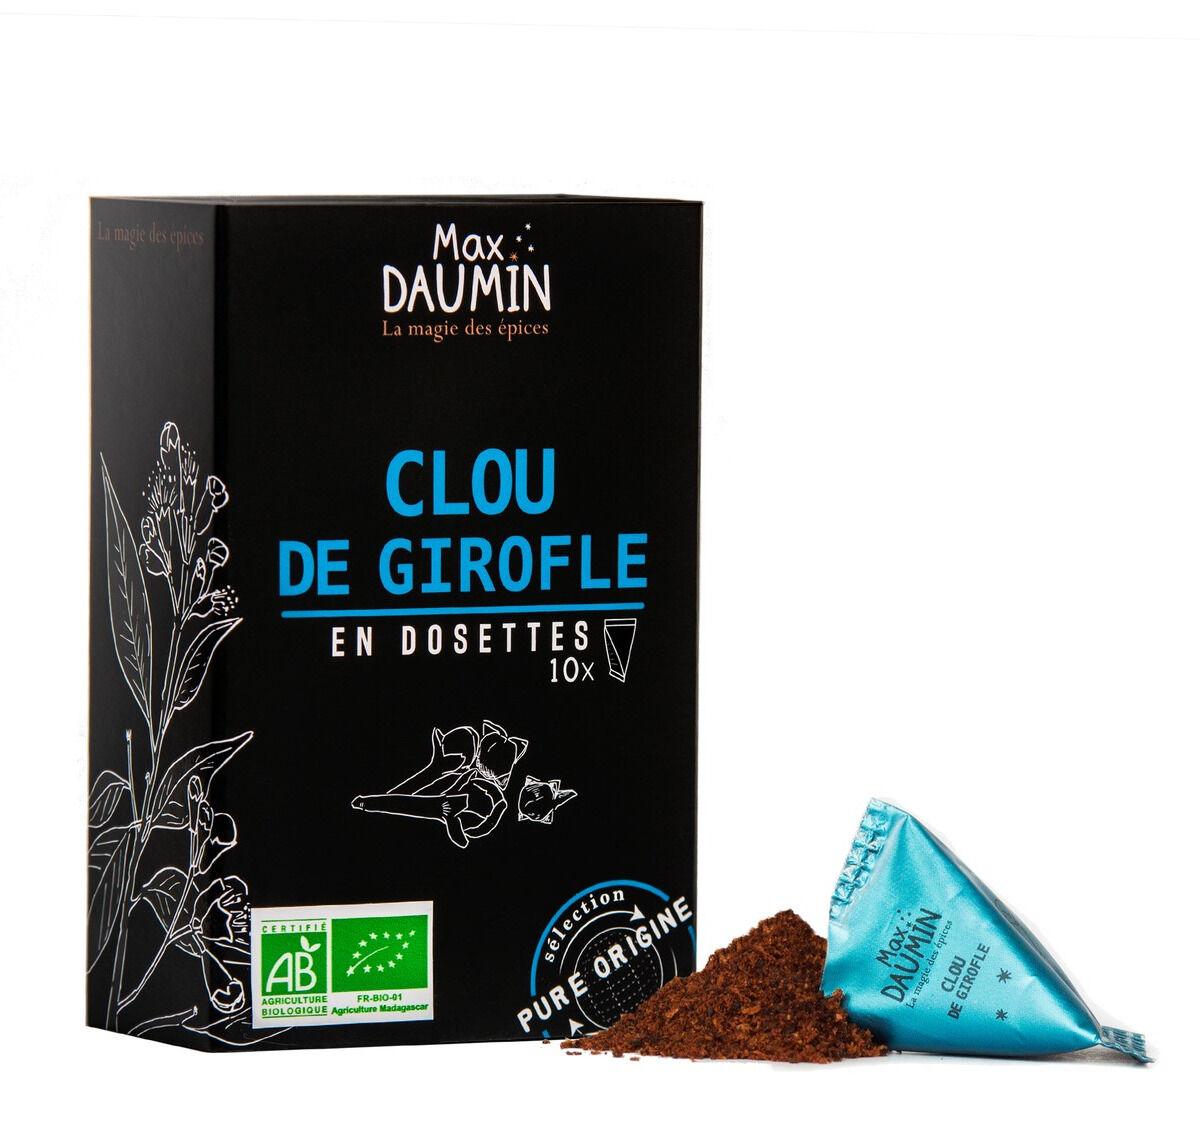 Epices Max Daumin Clou De Girofle - Boite de dix Dosettes